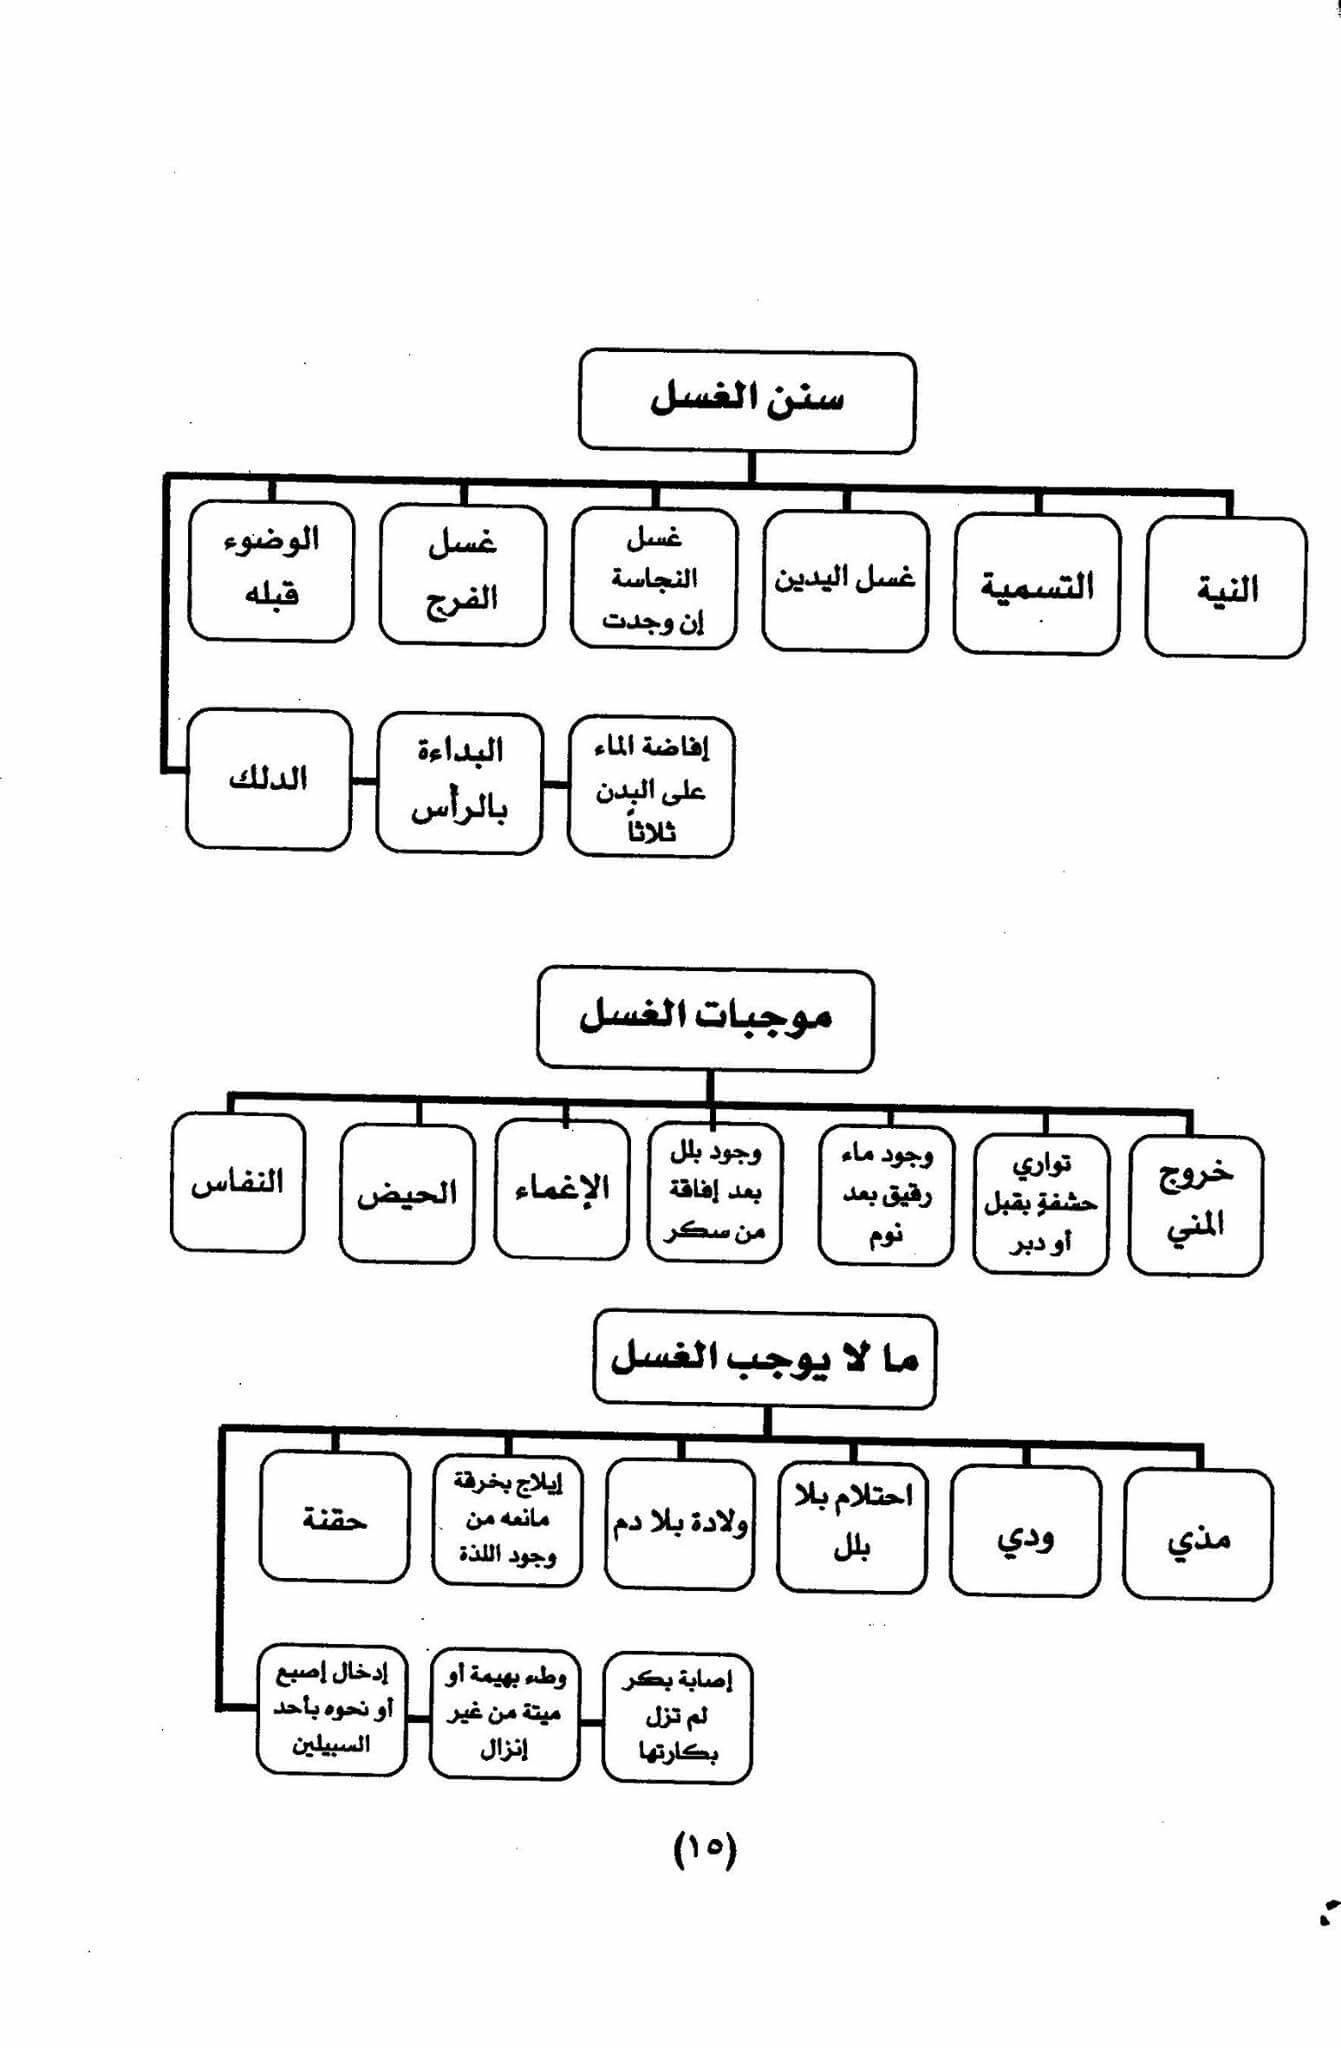 Pin By Ahmed Madi On اسلاميات Math Quran Diagram